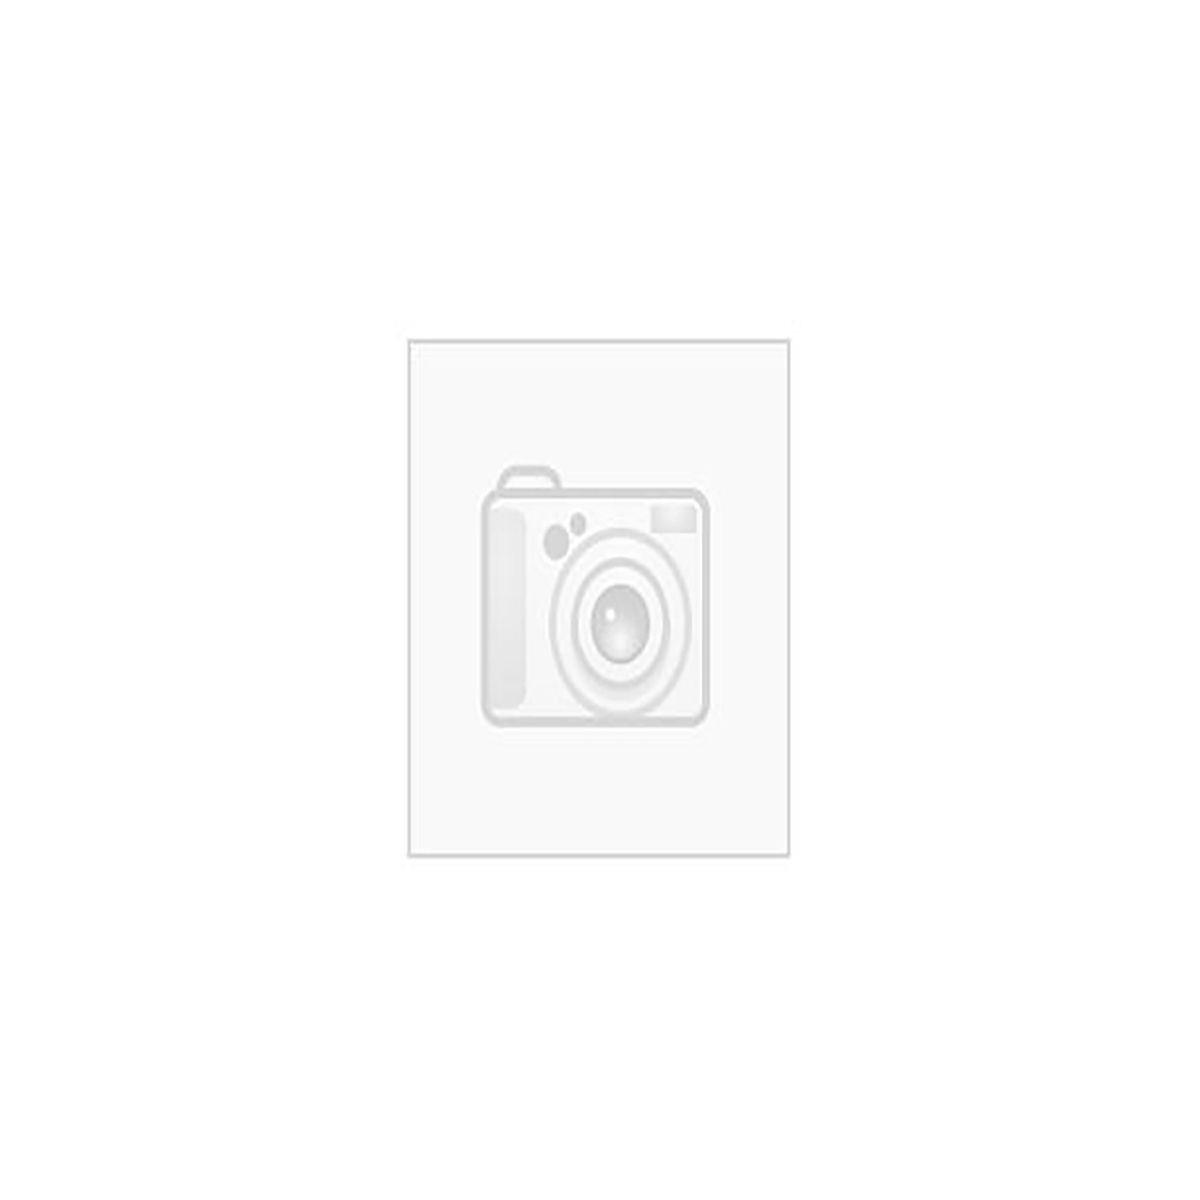 Tapwell BOX 026 - badekarbatteri